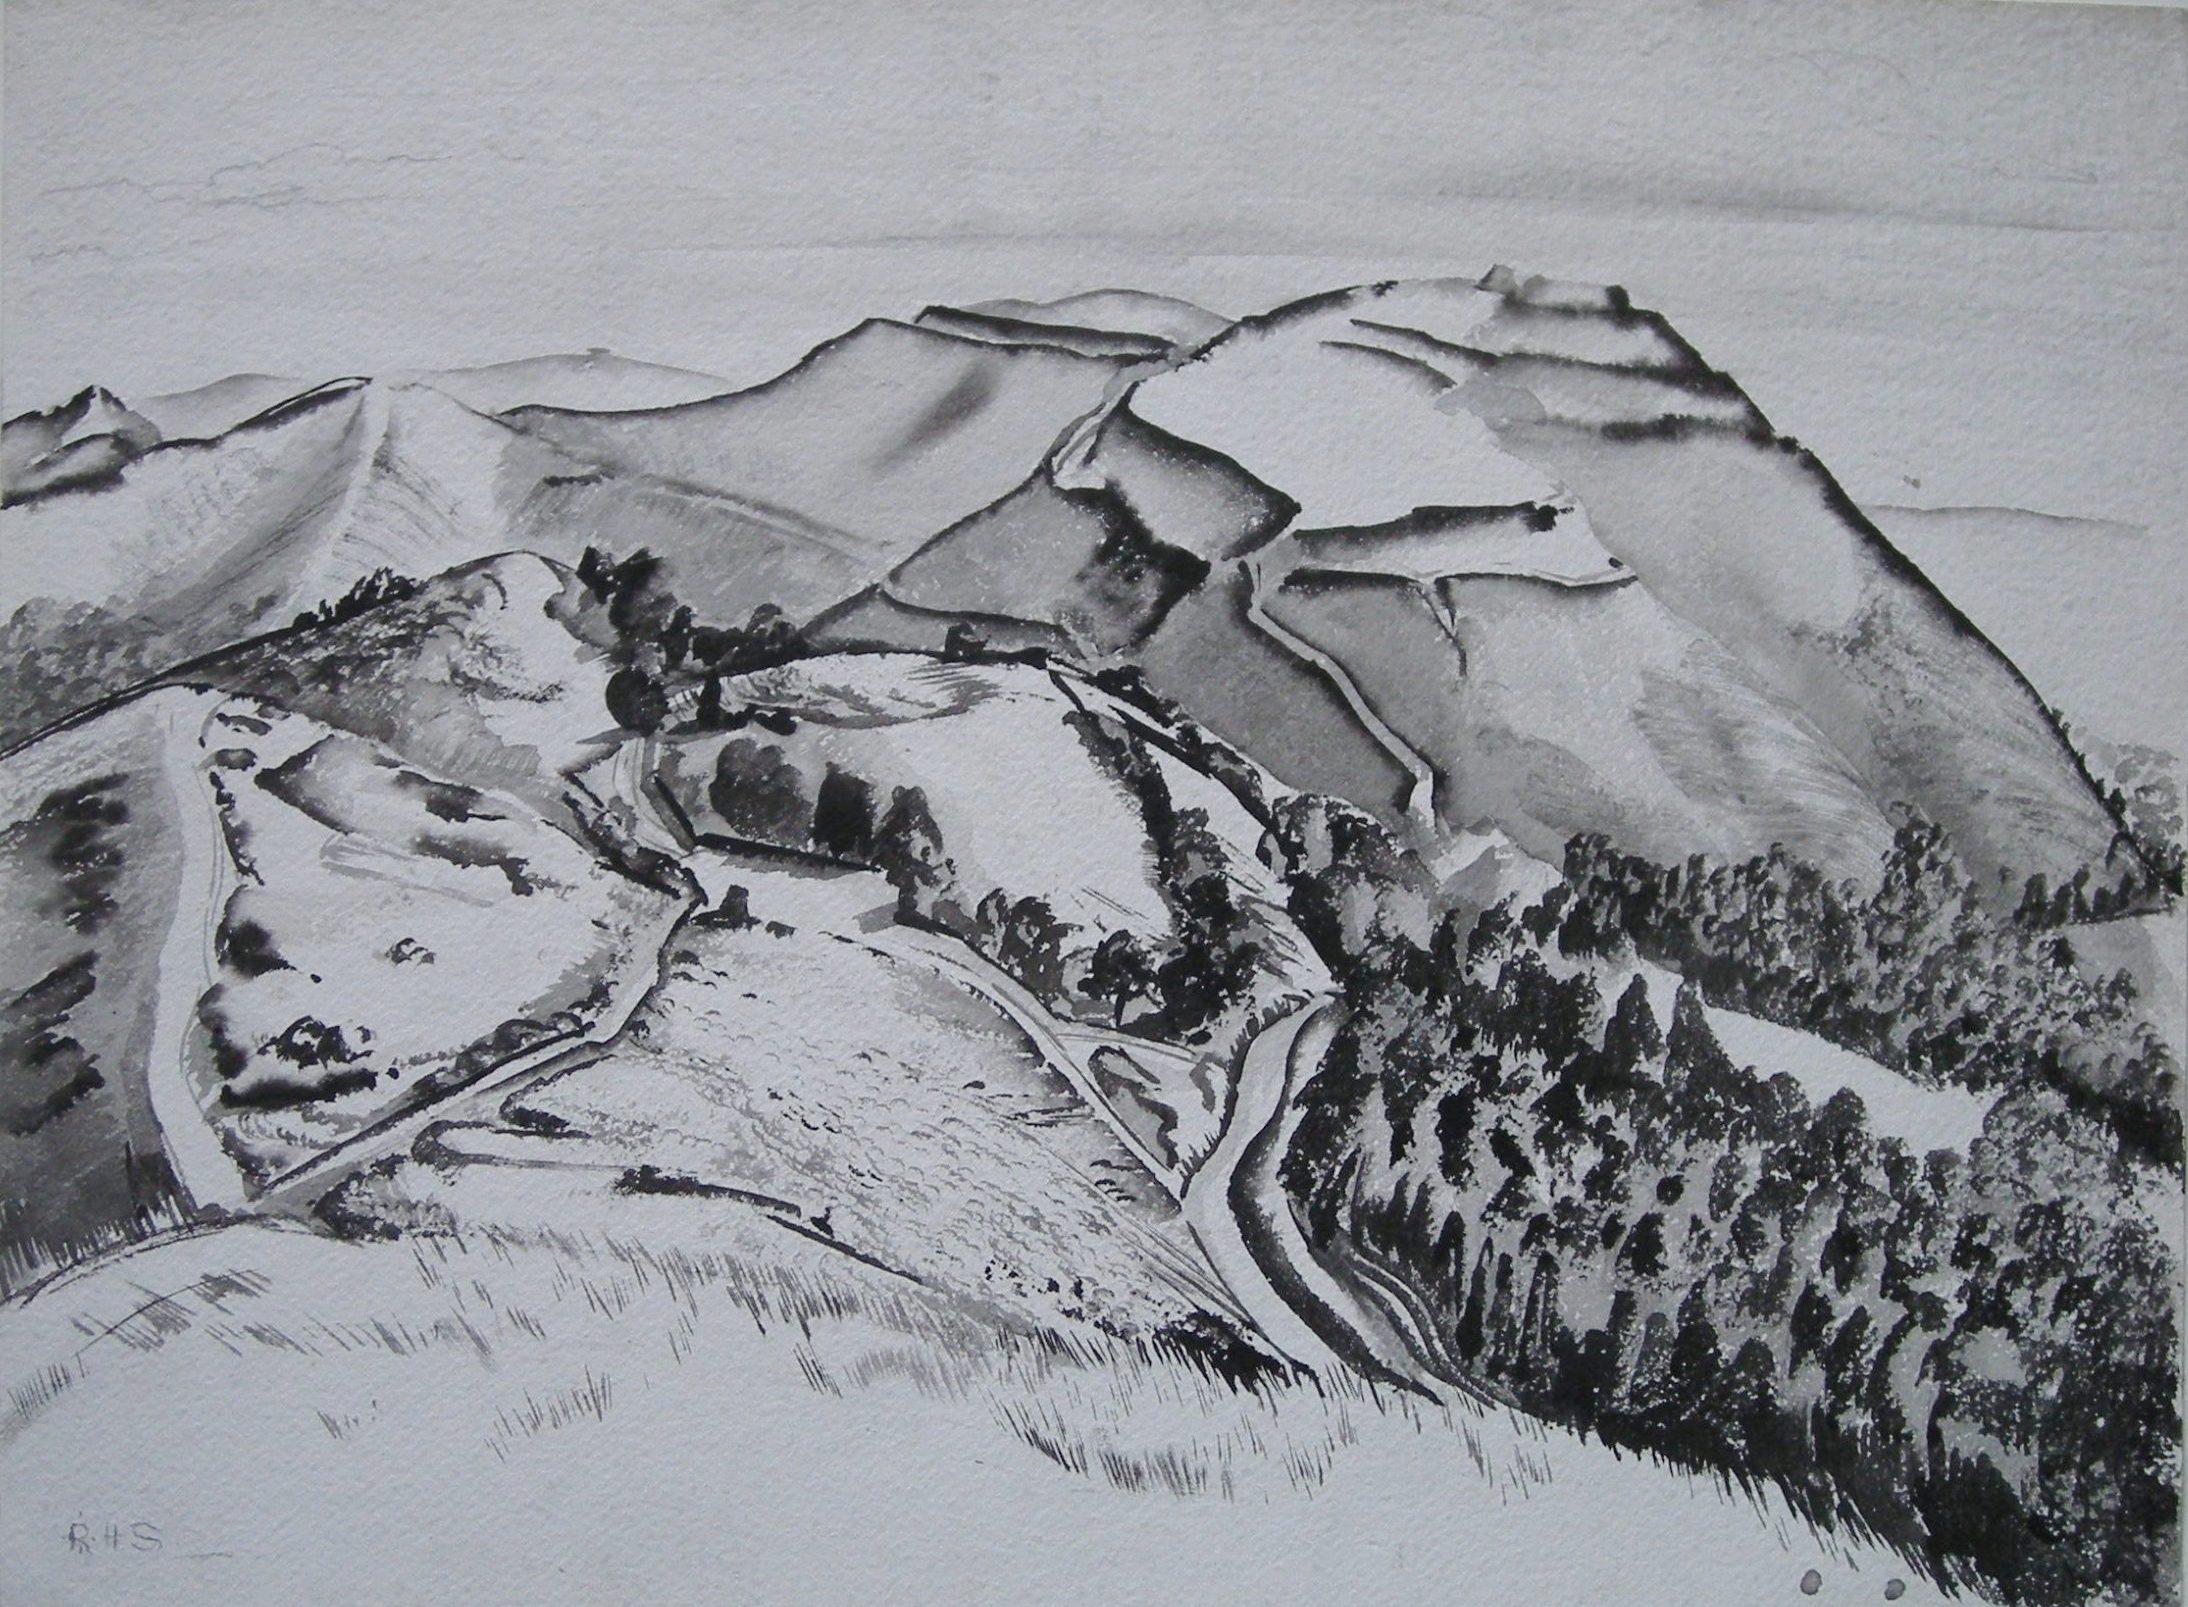 Rudolf Sauter - The Malvern Hills